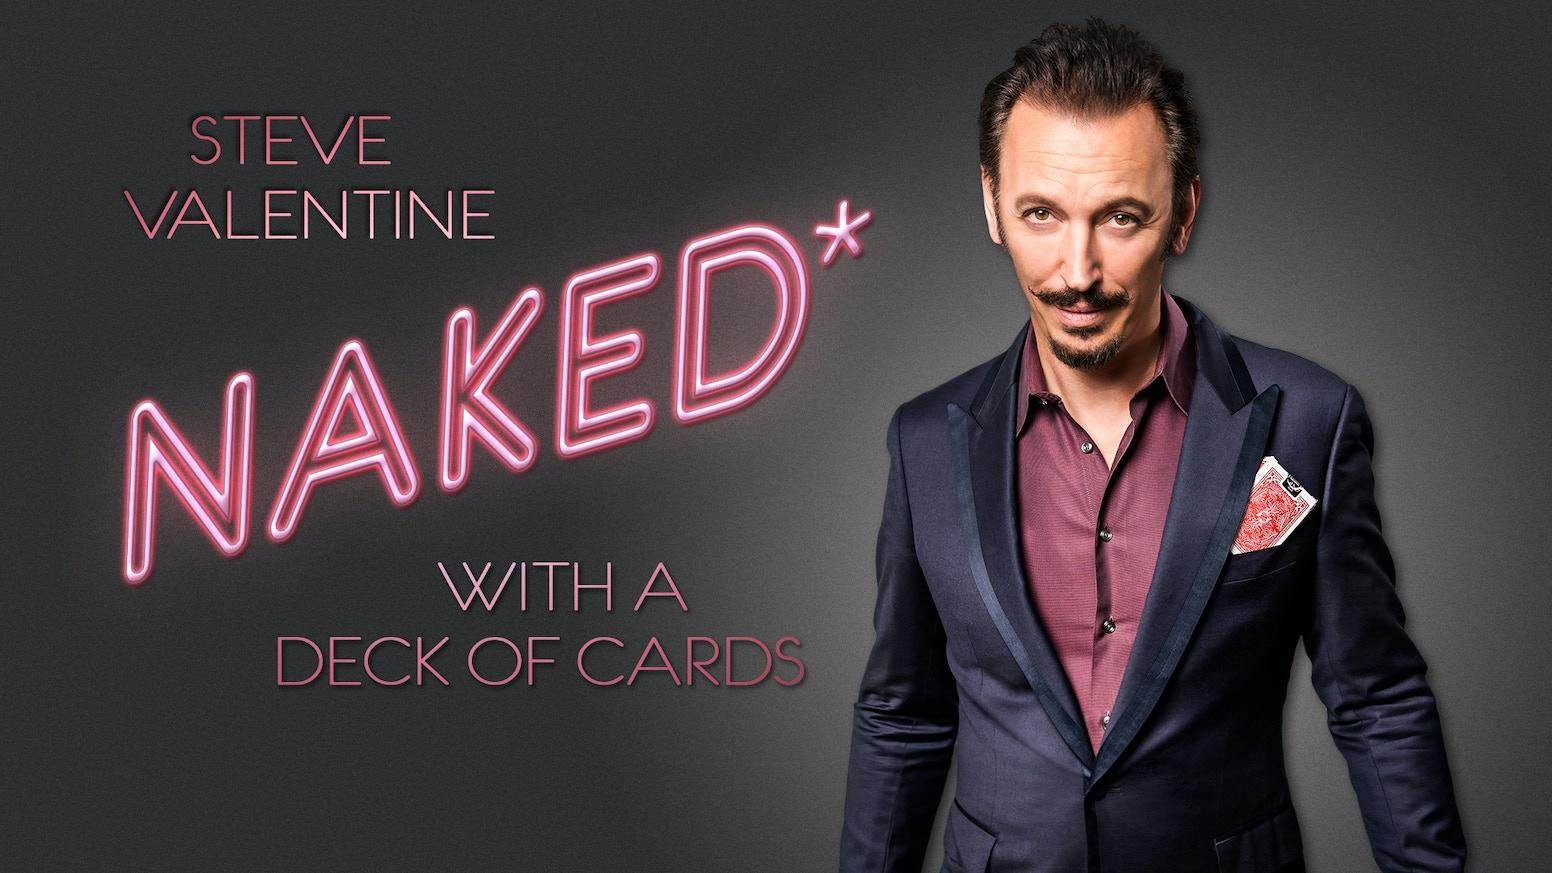 Cock naked valentine cards